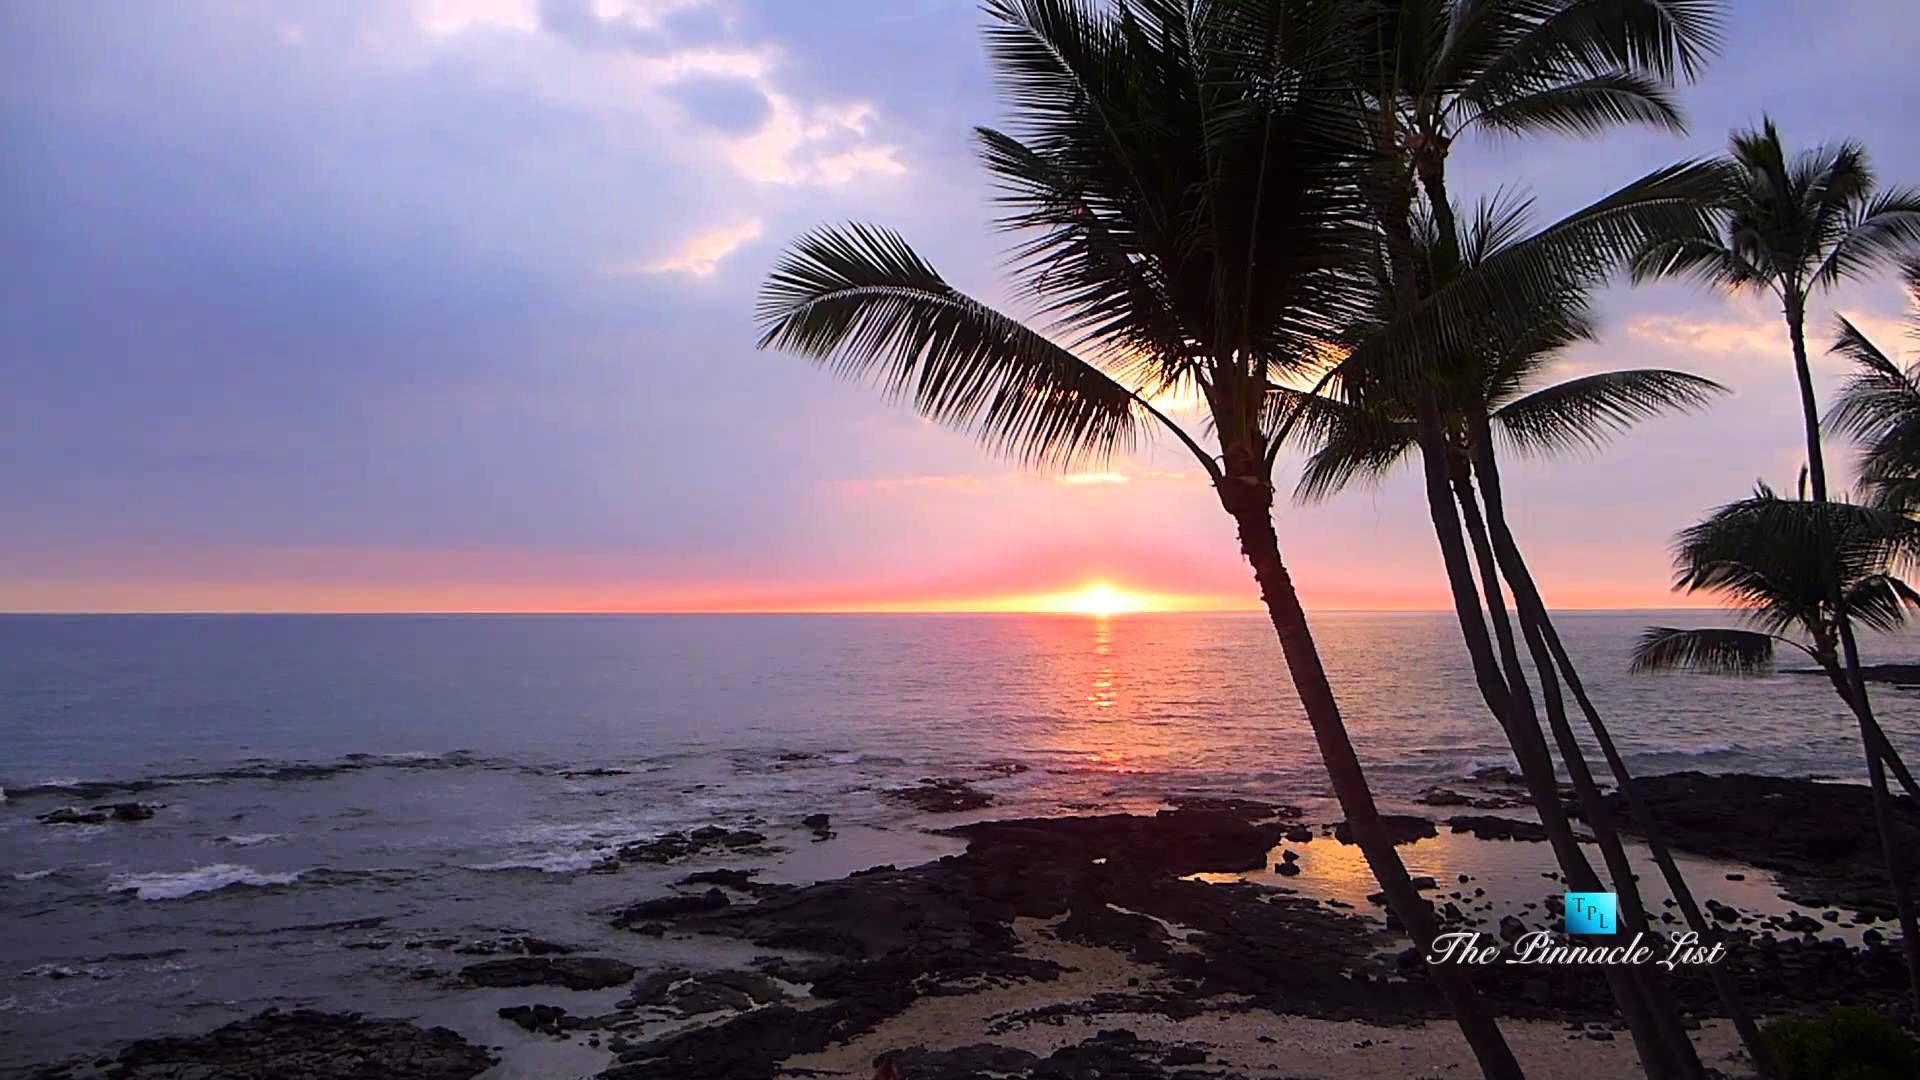 Big island sunset timelapse in kailua kona hawaii youtube big island sunset timelapse in kailua kona hawaii youtube nvjuhfo Gallery